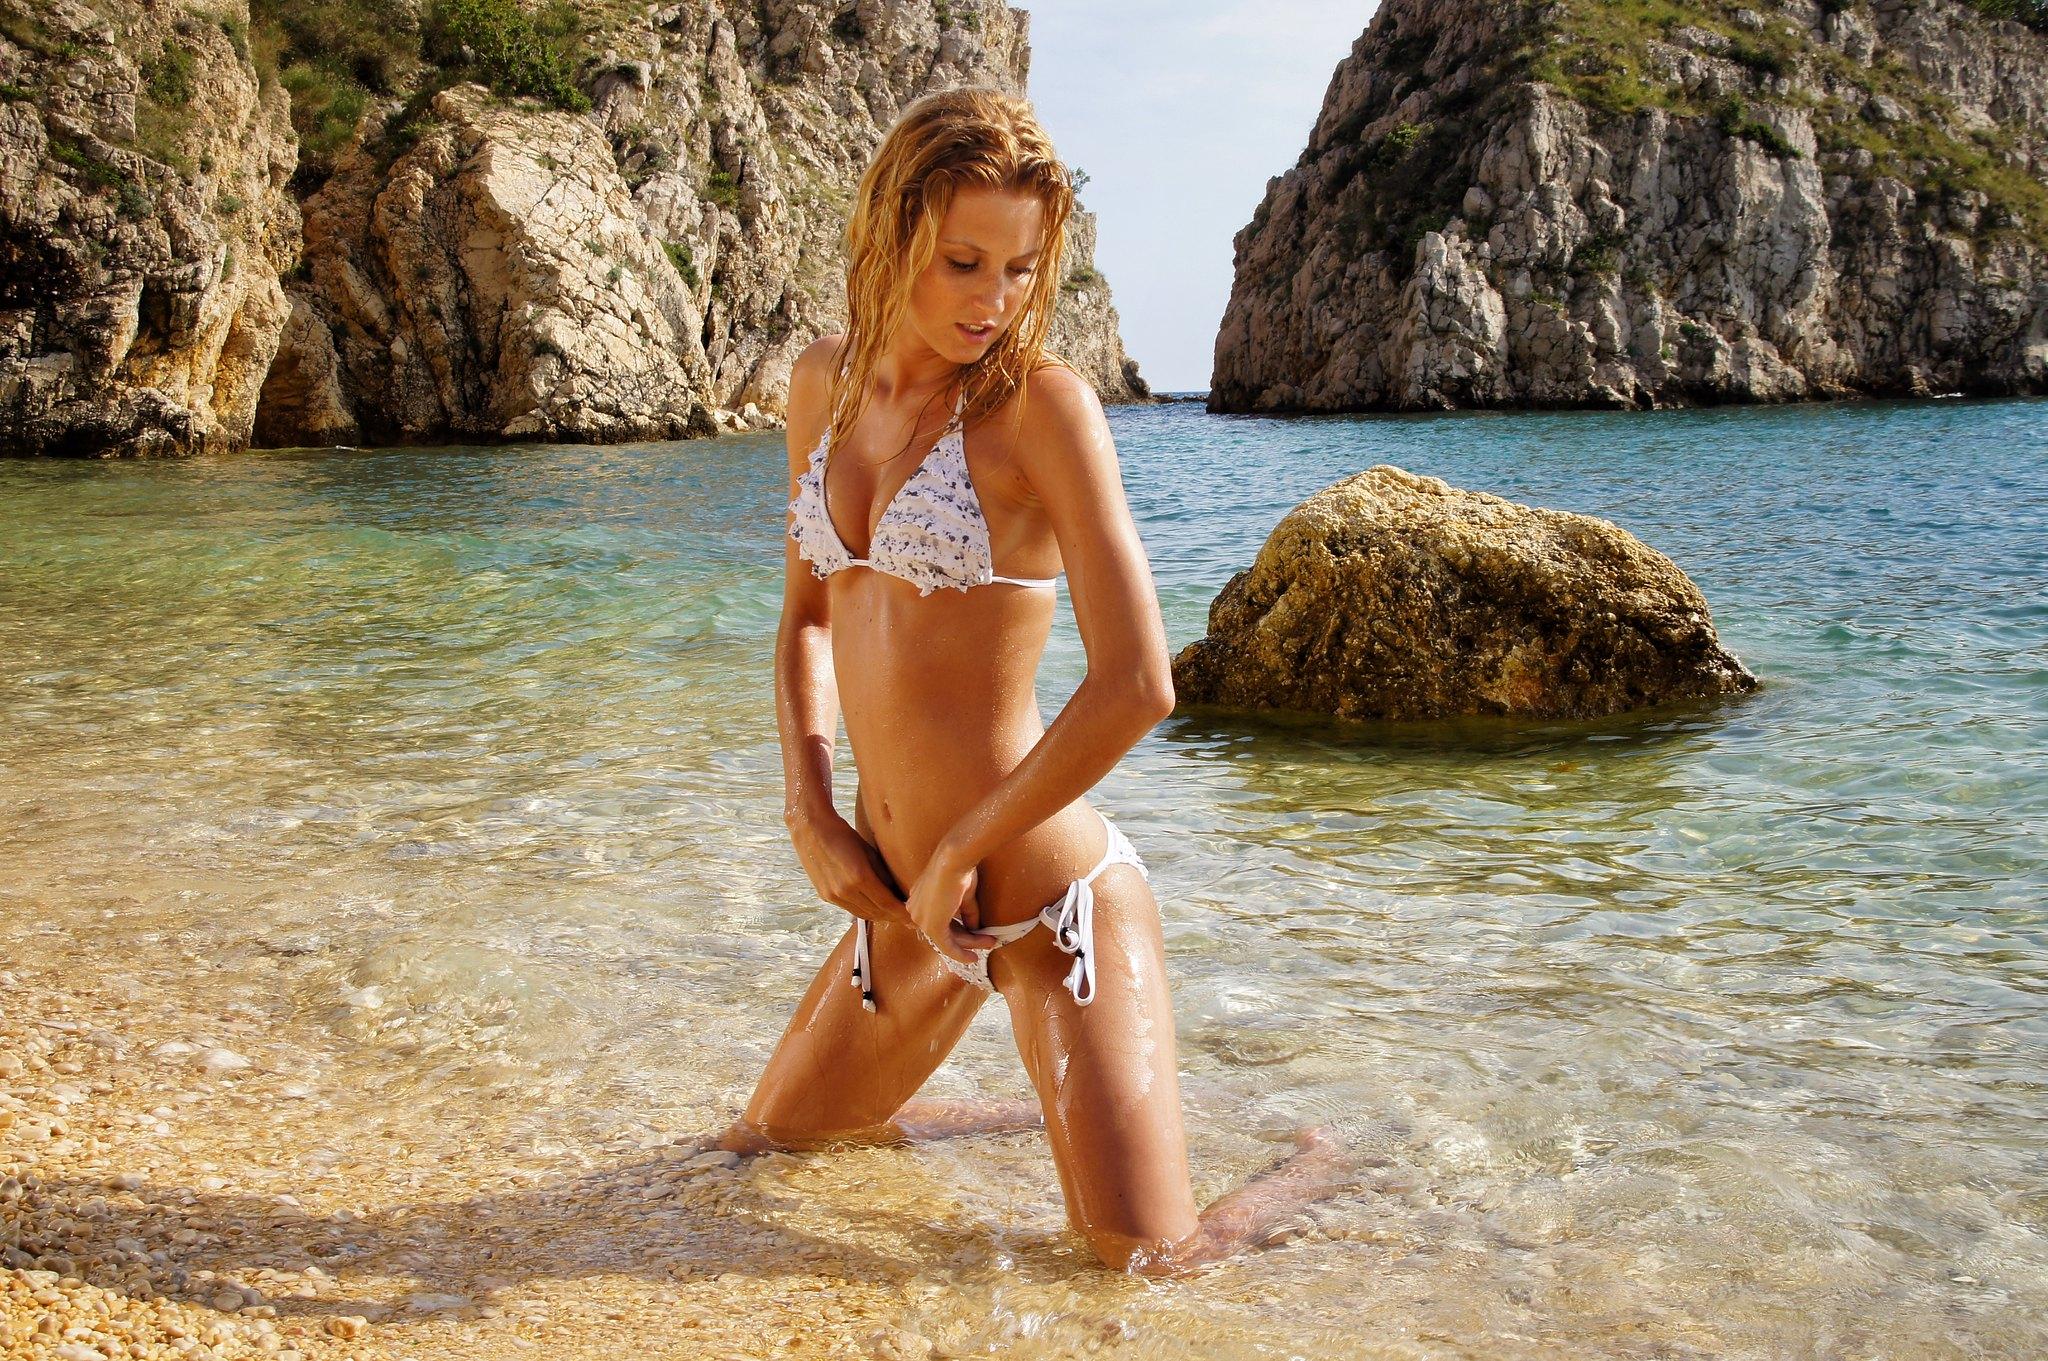 Lefkada bikini girl